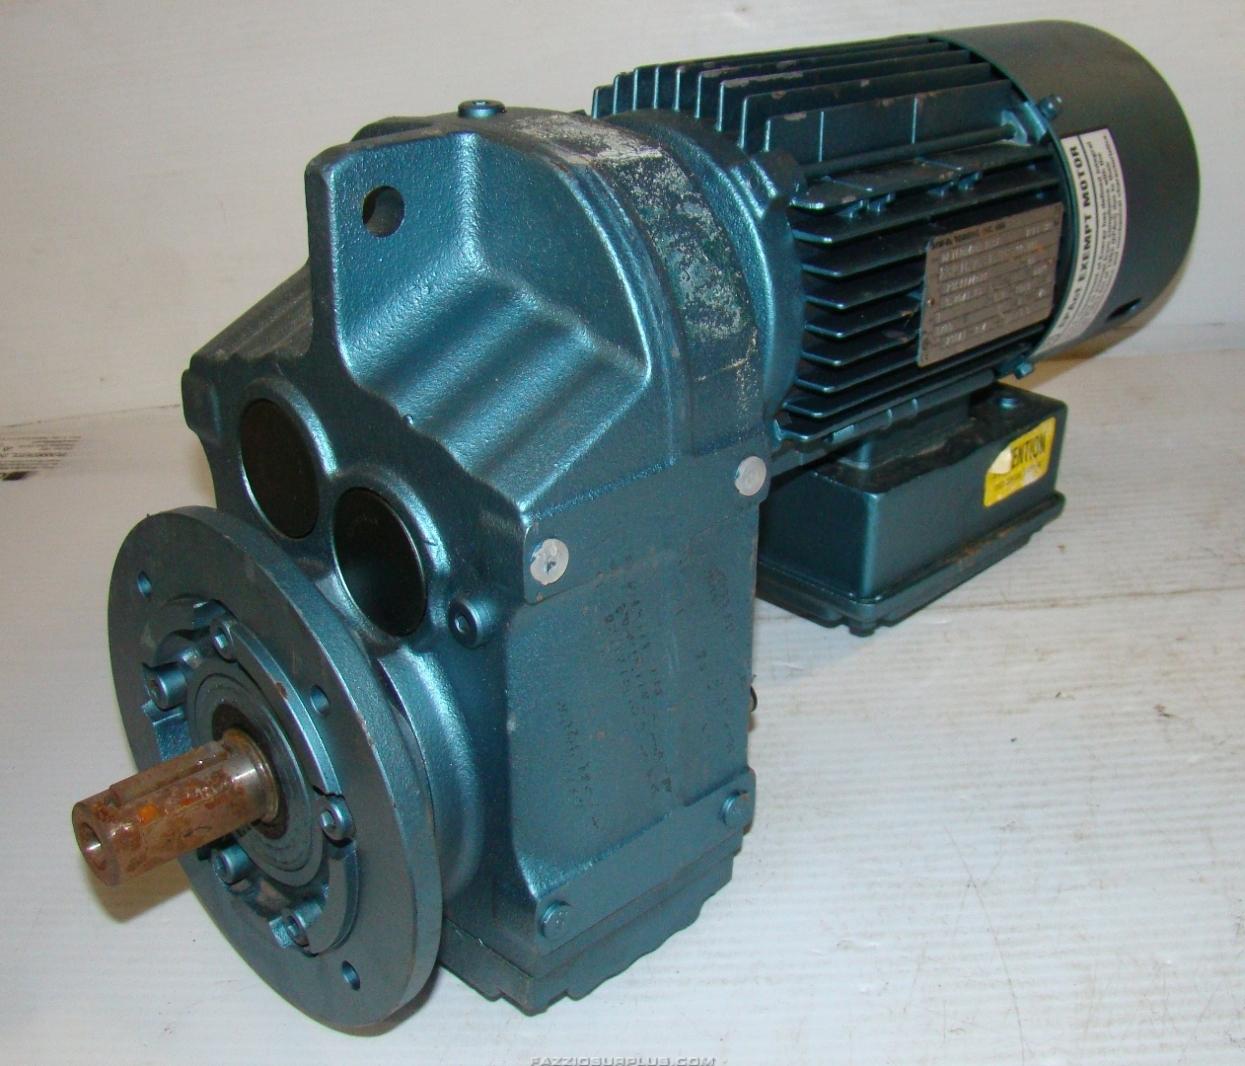 Sew eurodrive 1hp brake motor 230 460v dft80n4bmg1hrz ebay for Sew motors and drives